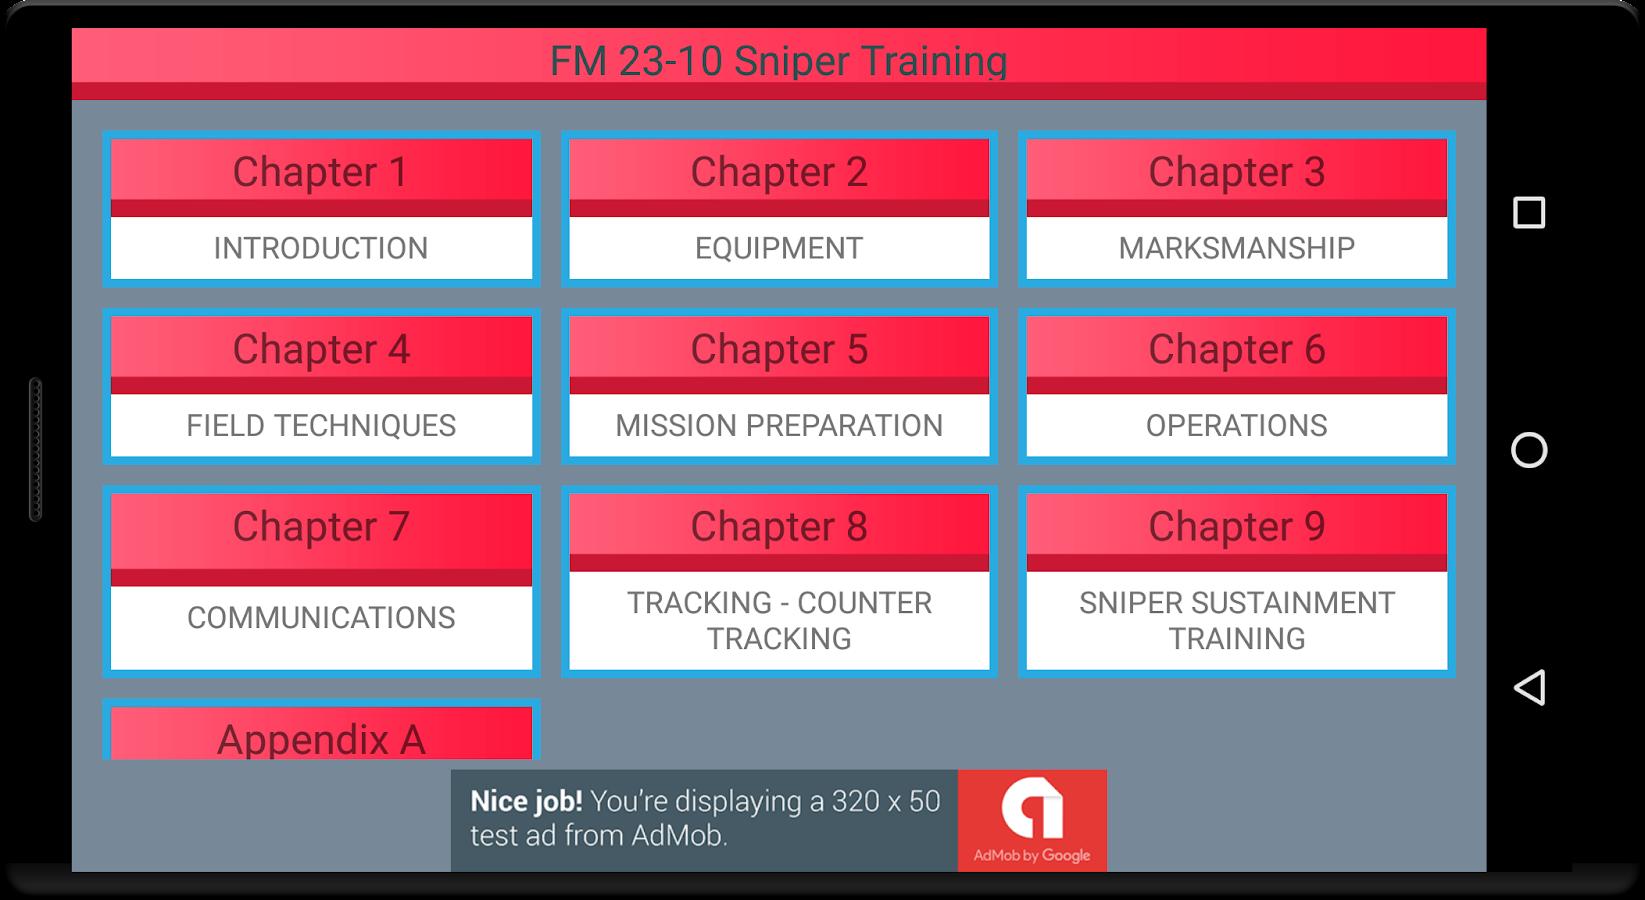 Sniper Training FM 23-10 Manual (CD)